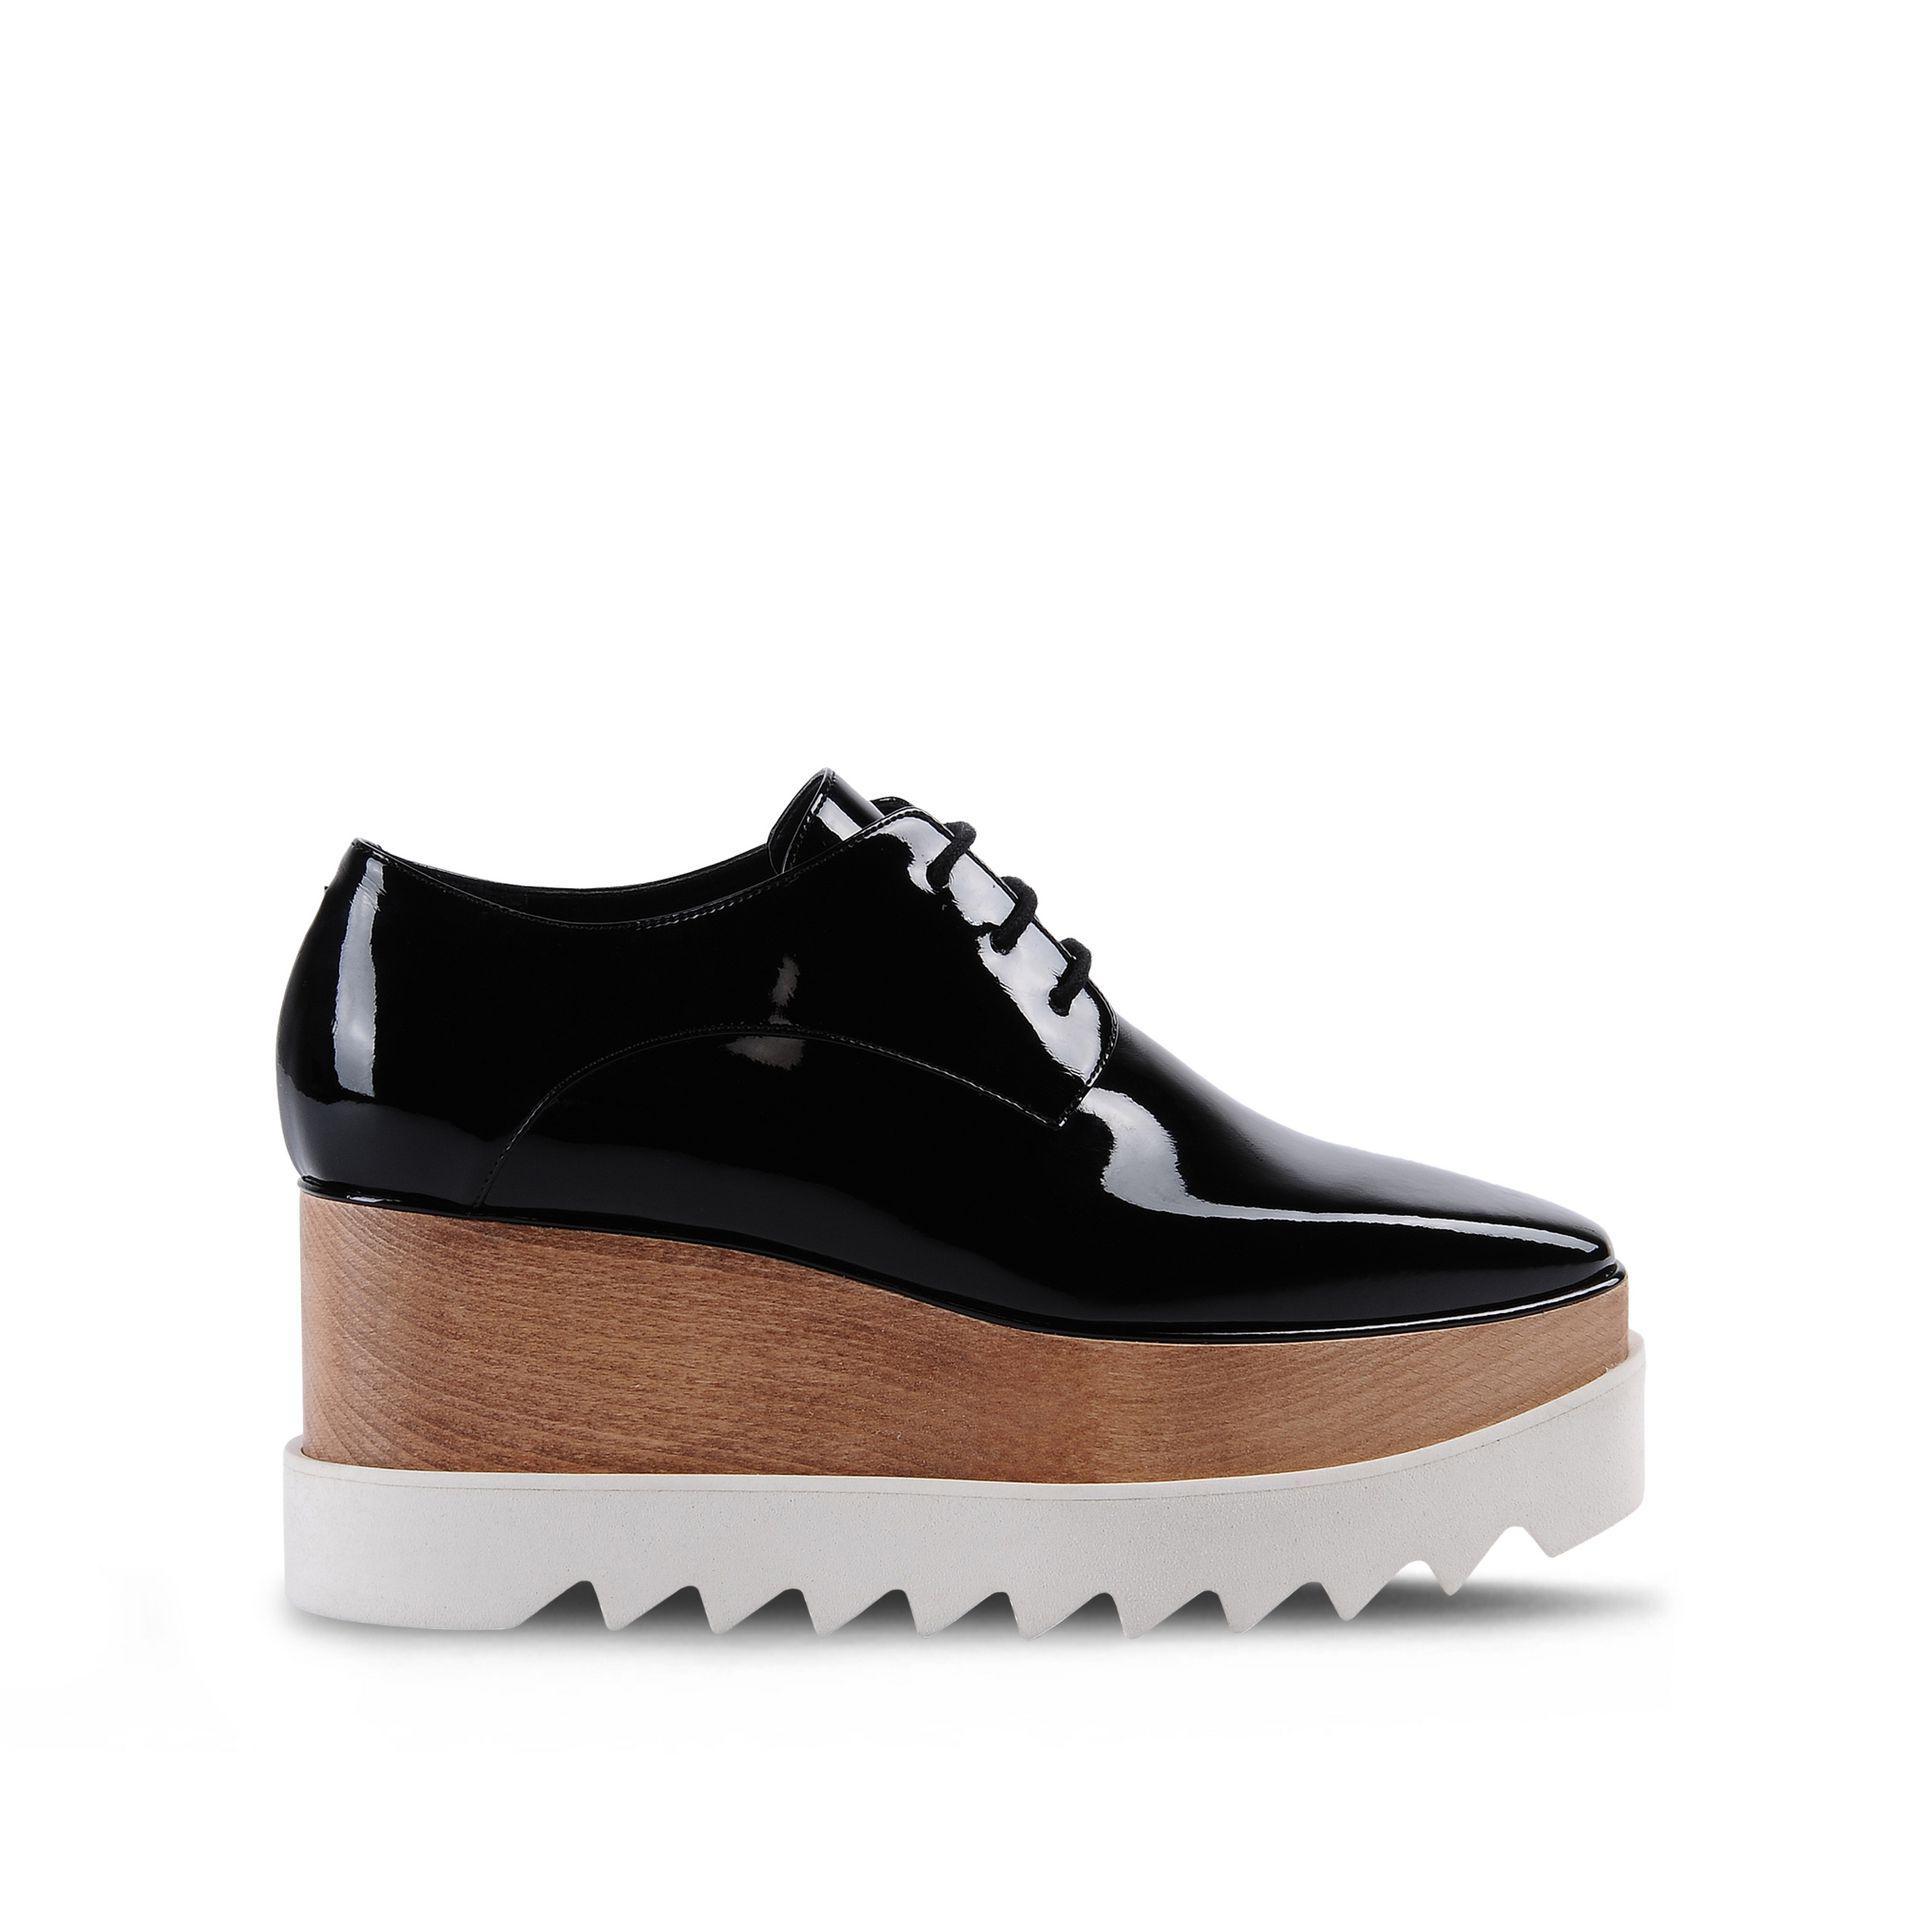 Elyse Patent Platform Shoes in Black